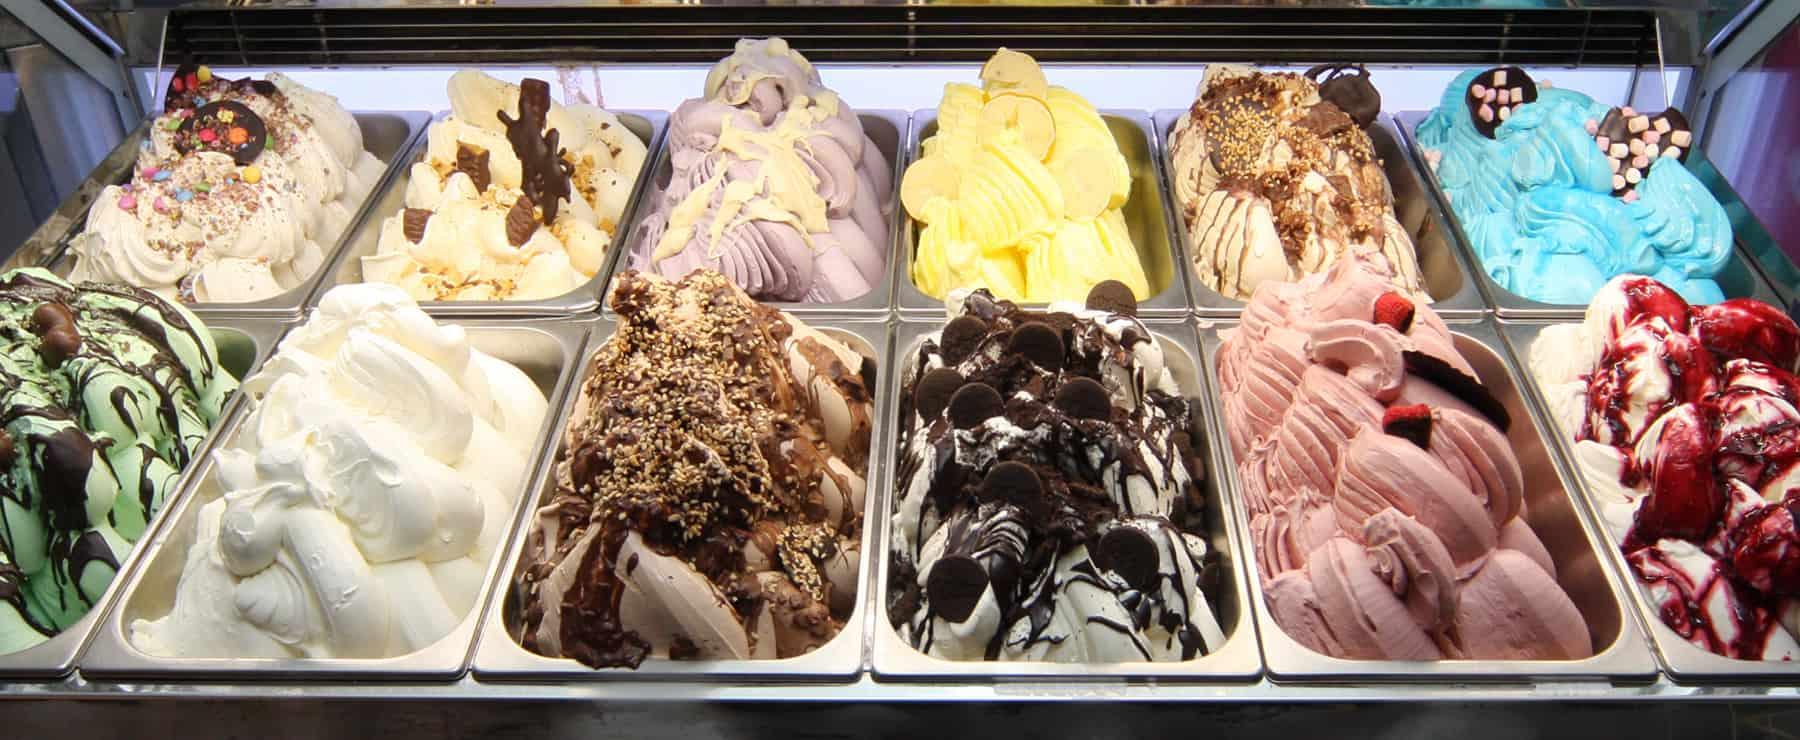 Martin Food Equipment Ice-Cream-Slider-Photo-1 Home